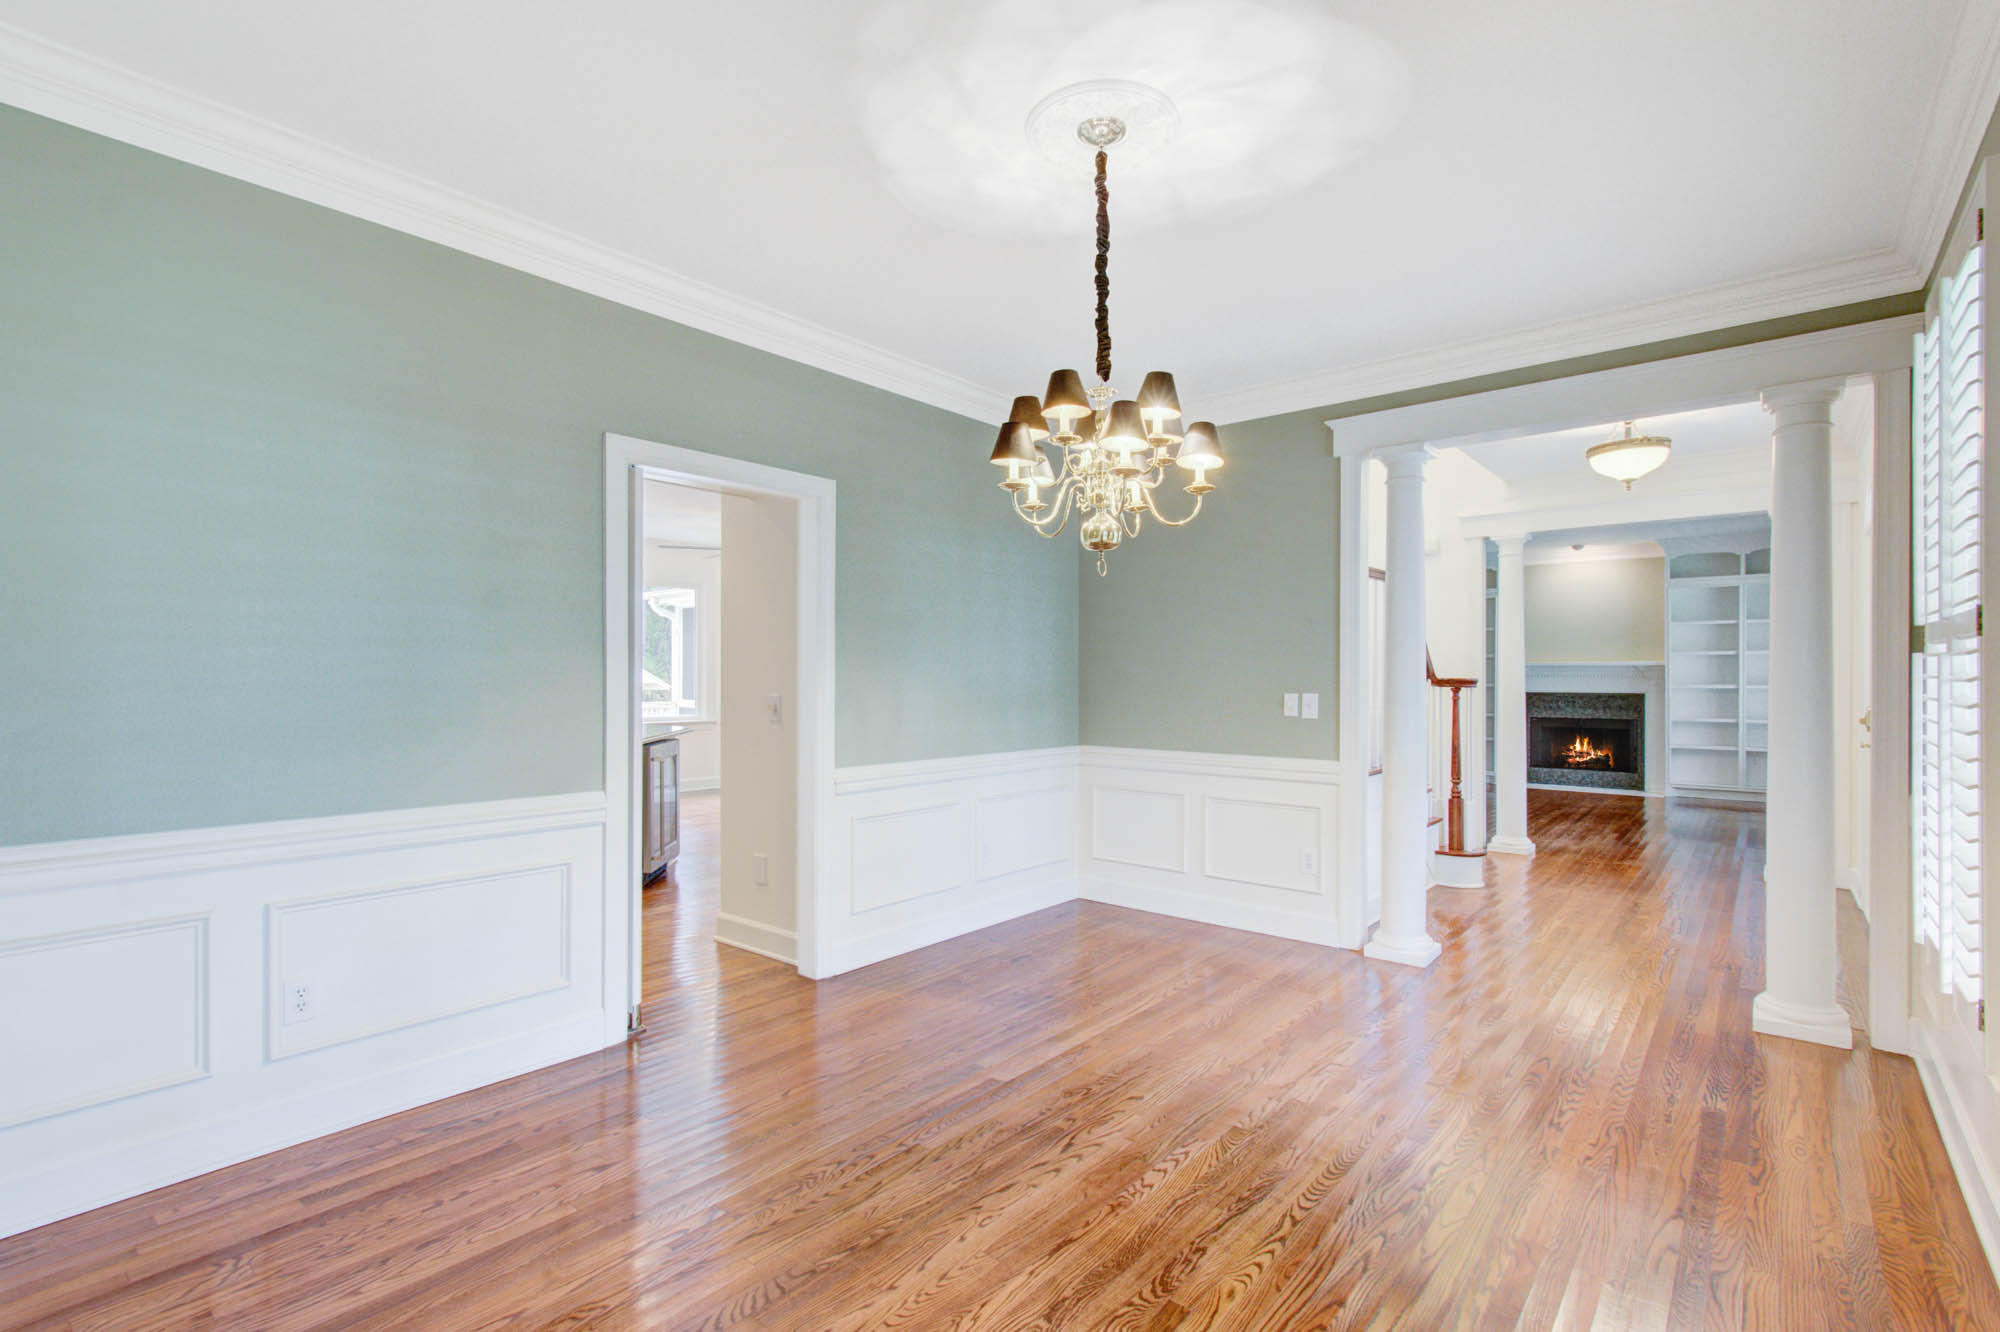 Dunes West Homes For Sale - 3515 Colonel Vanderhorst, Mount Pleasant, SC - 42